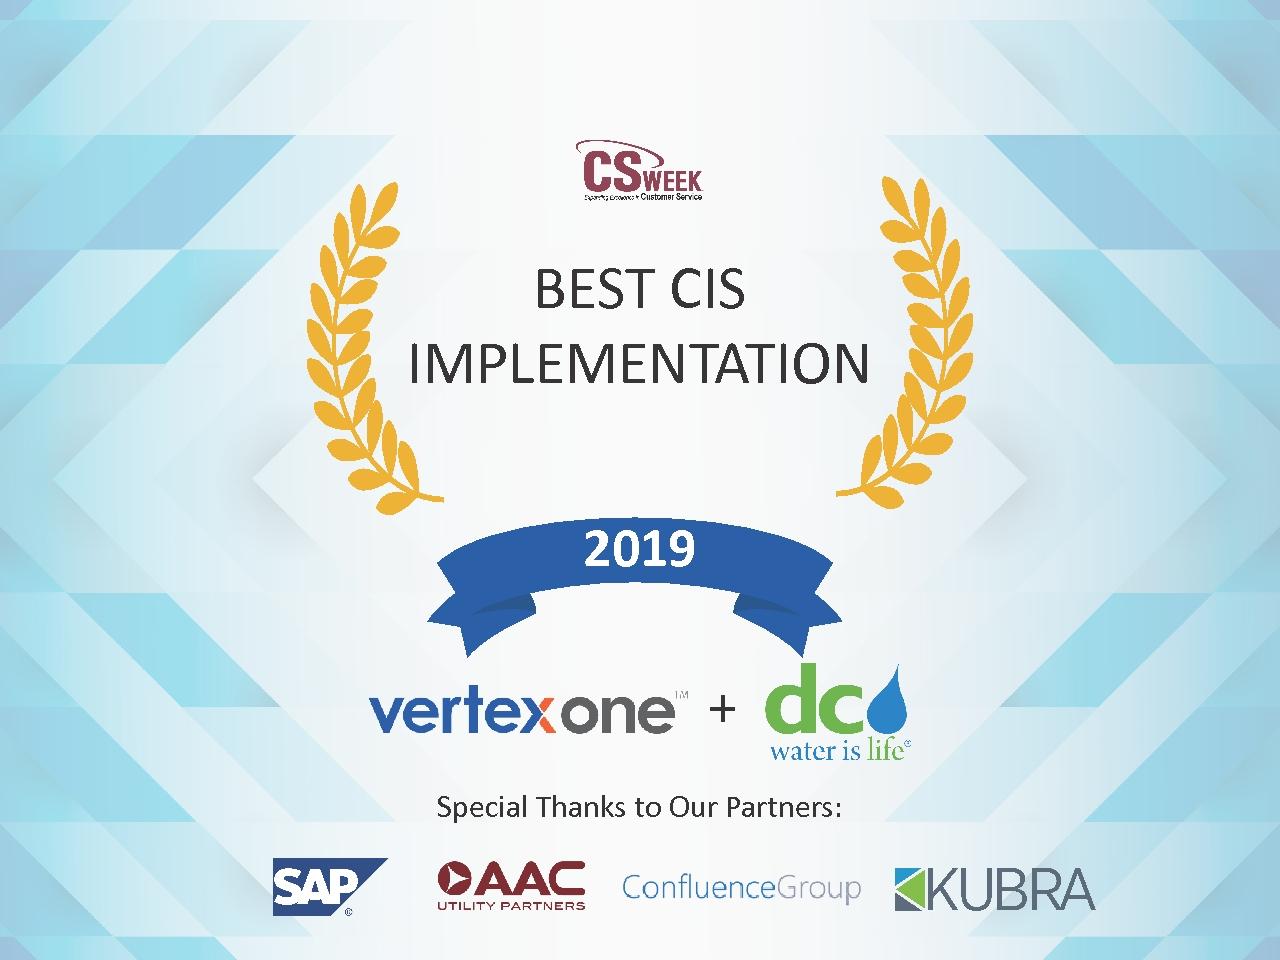 DC Water's VertexOne Customer Platform Initiative Recognized with